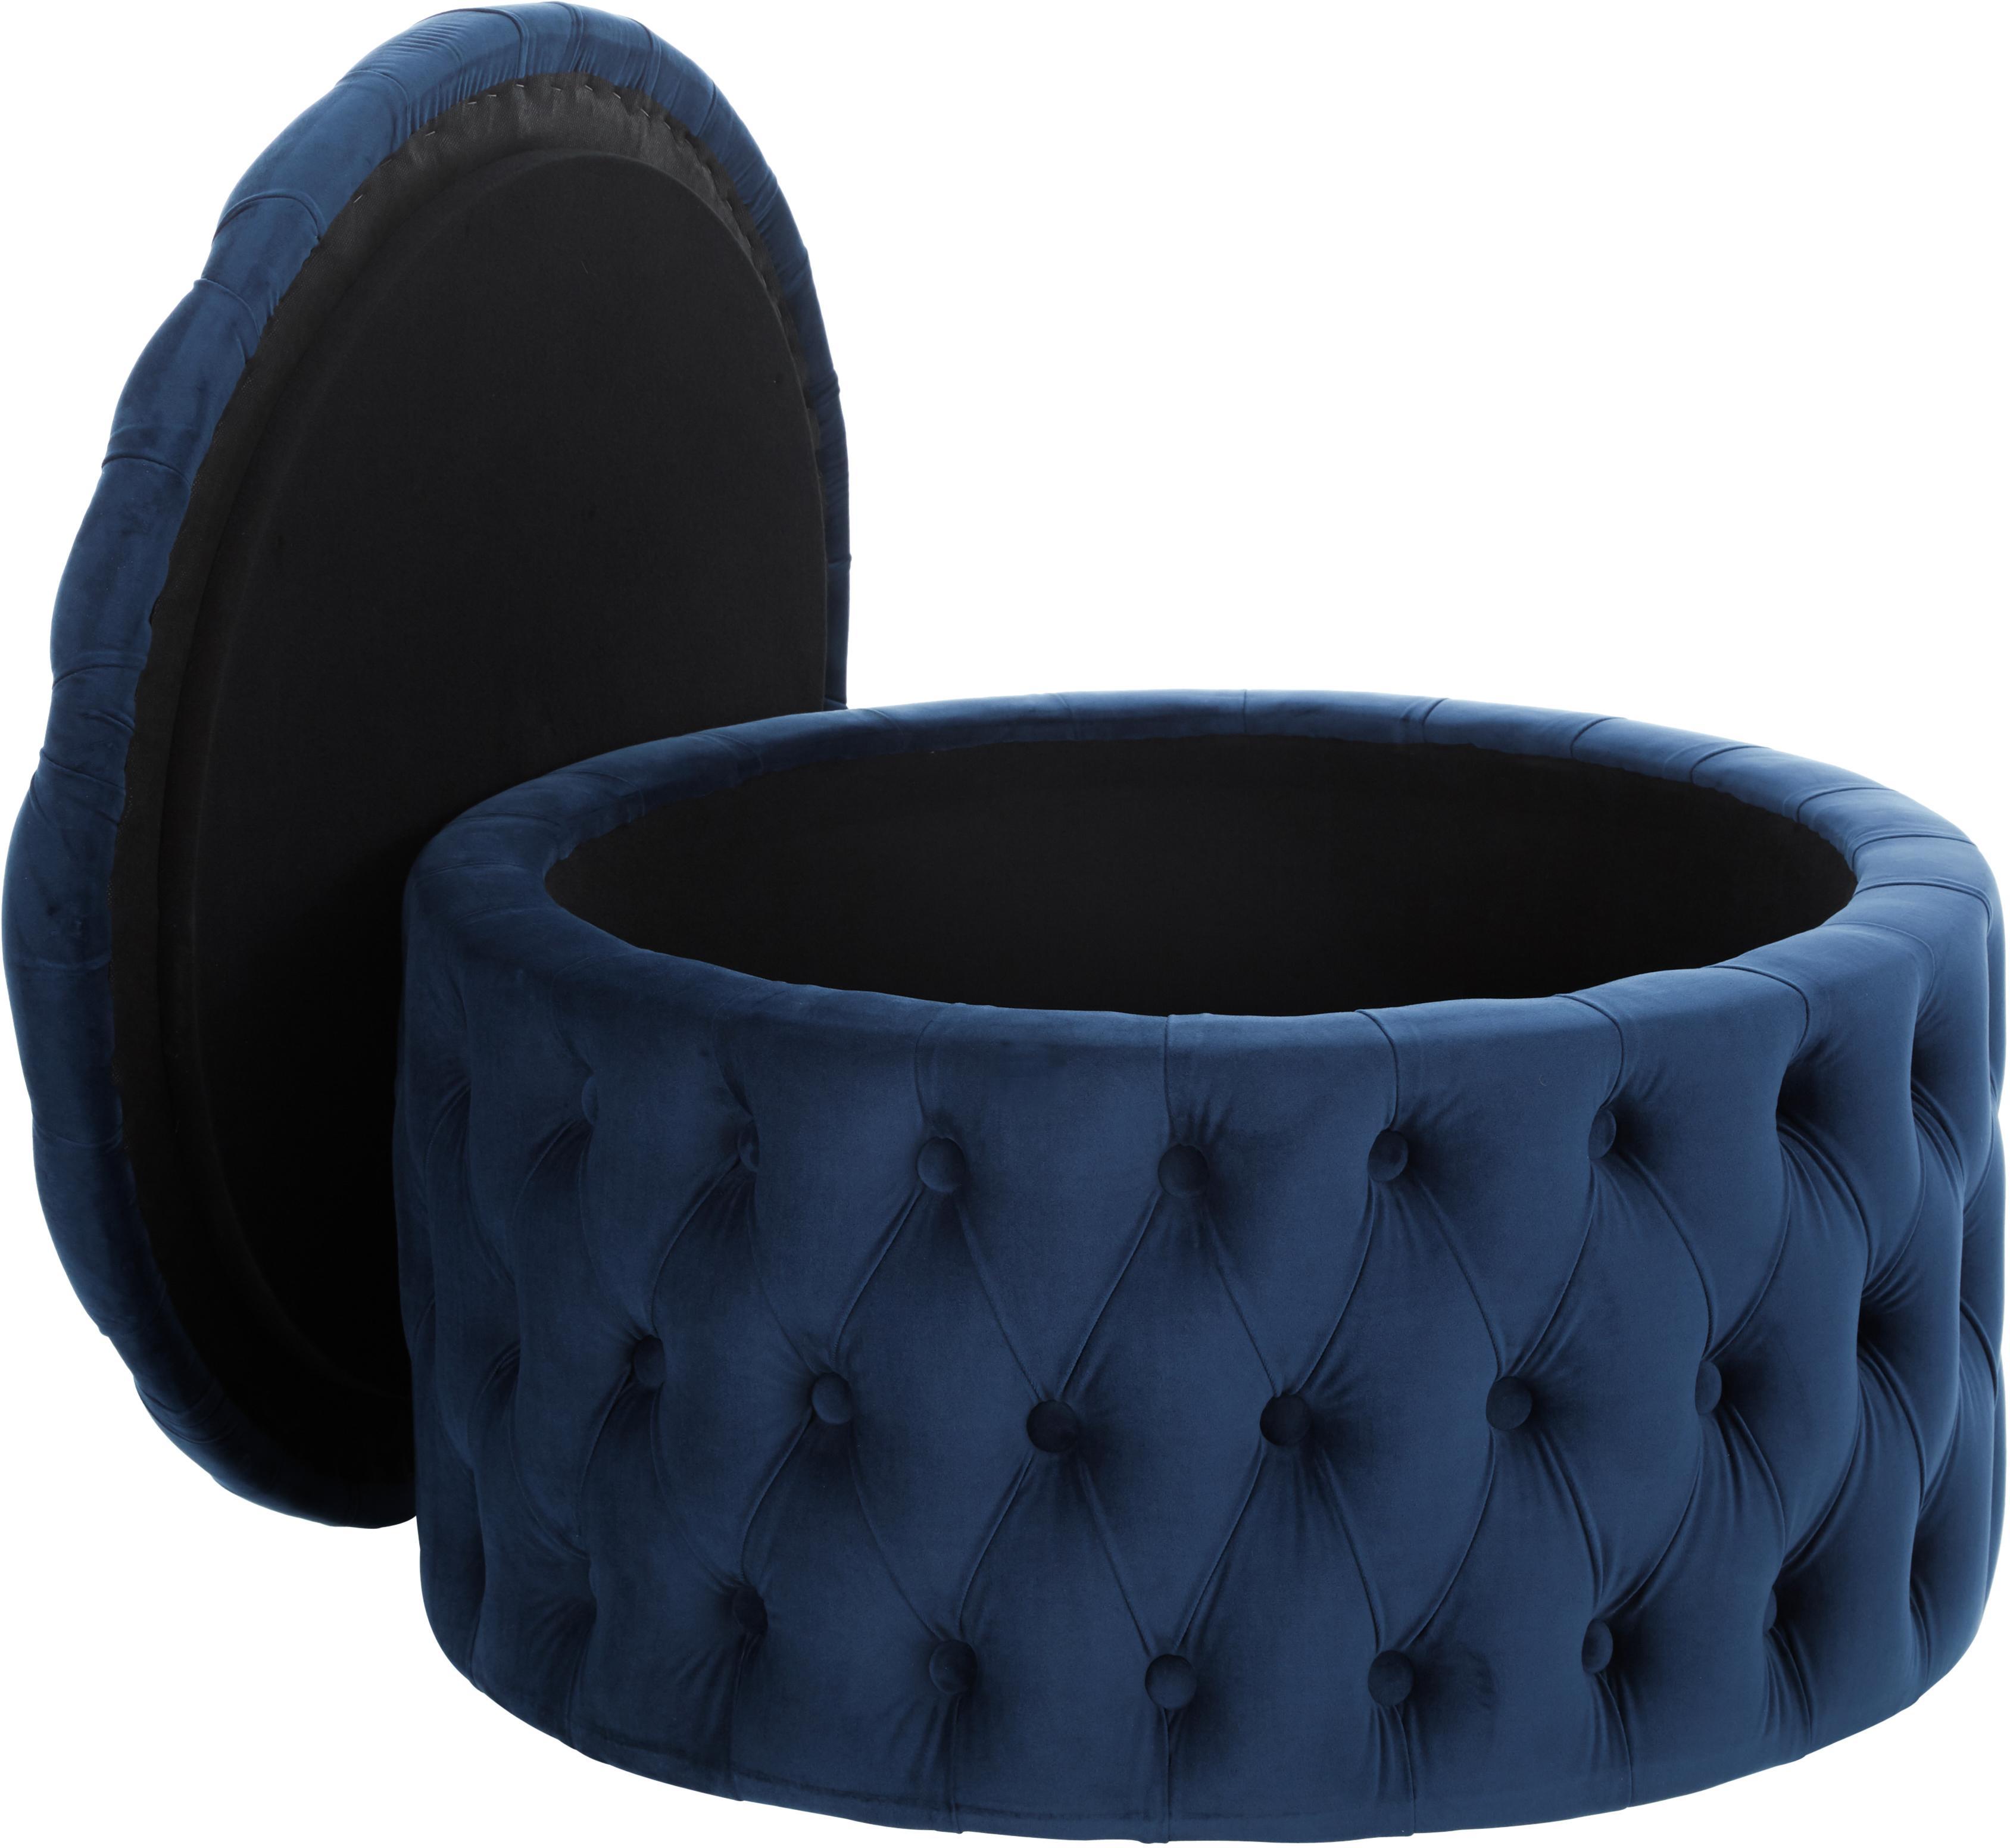 XL Samt-Hocker Chiara mit Stauraum, Bezug: Samt (Polyester) 20.000 S, Korpus: Eukalyptusholz, Blau, ∅ 70 x H 42 cm